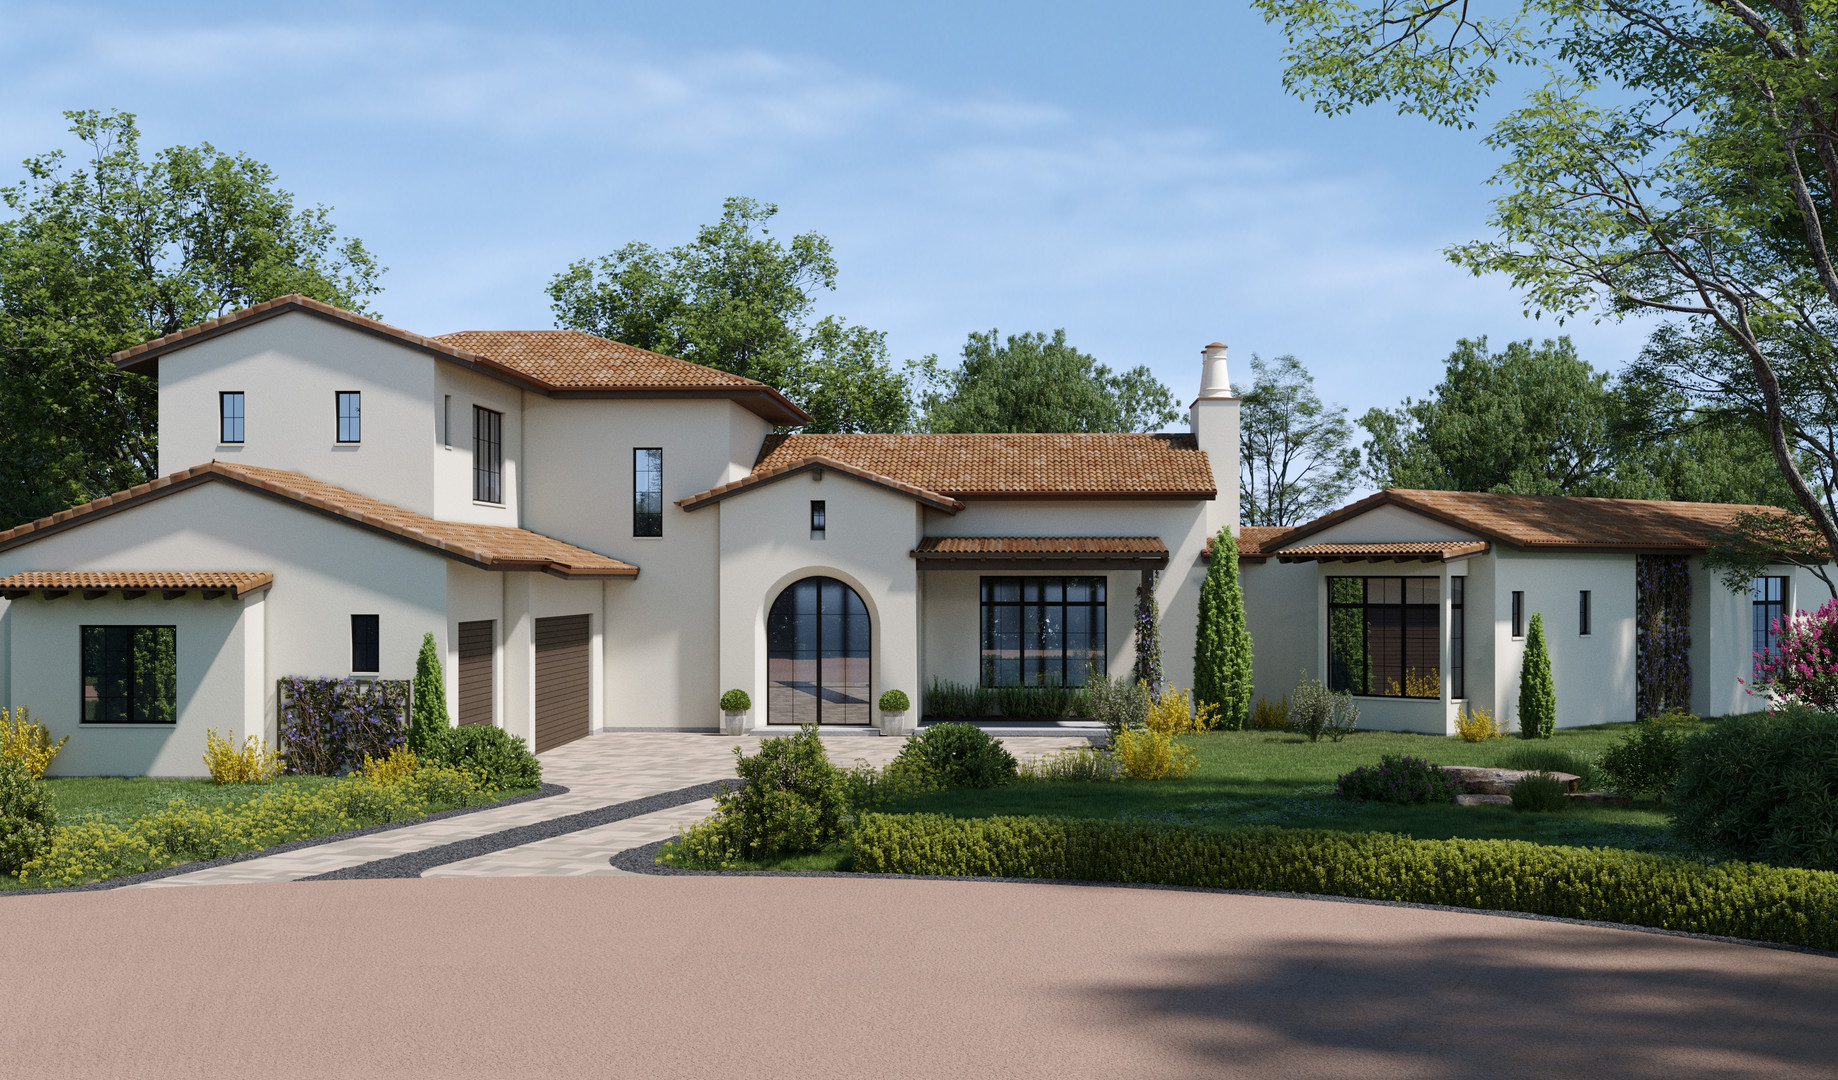 Дизайн фасада в г. Хорсшу Бэй, Техас, США